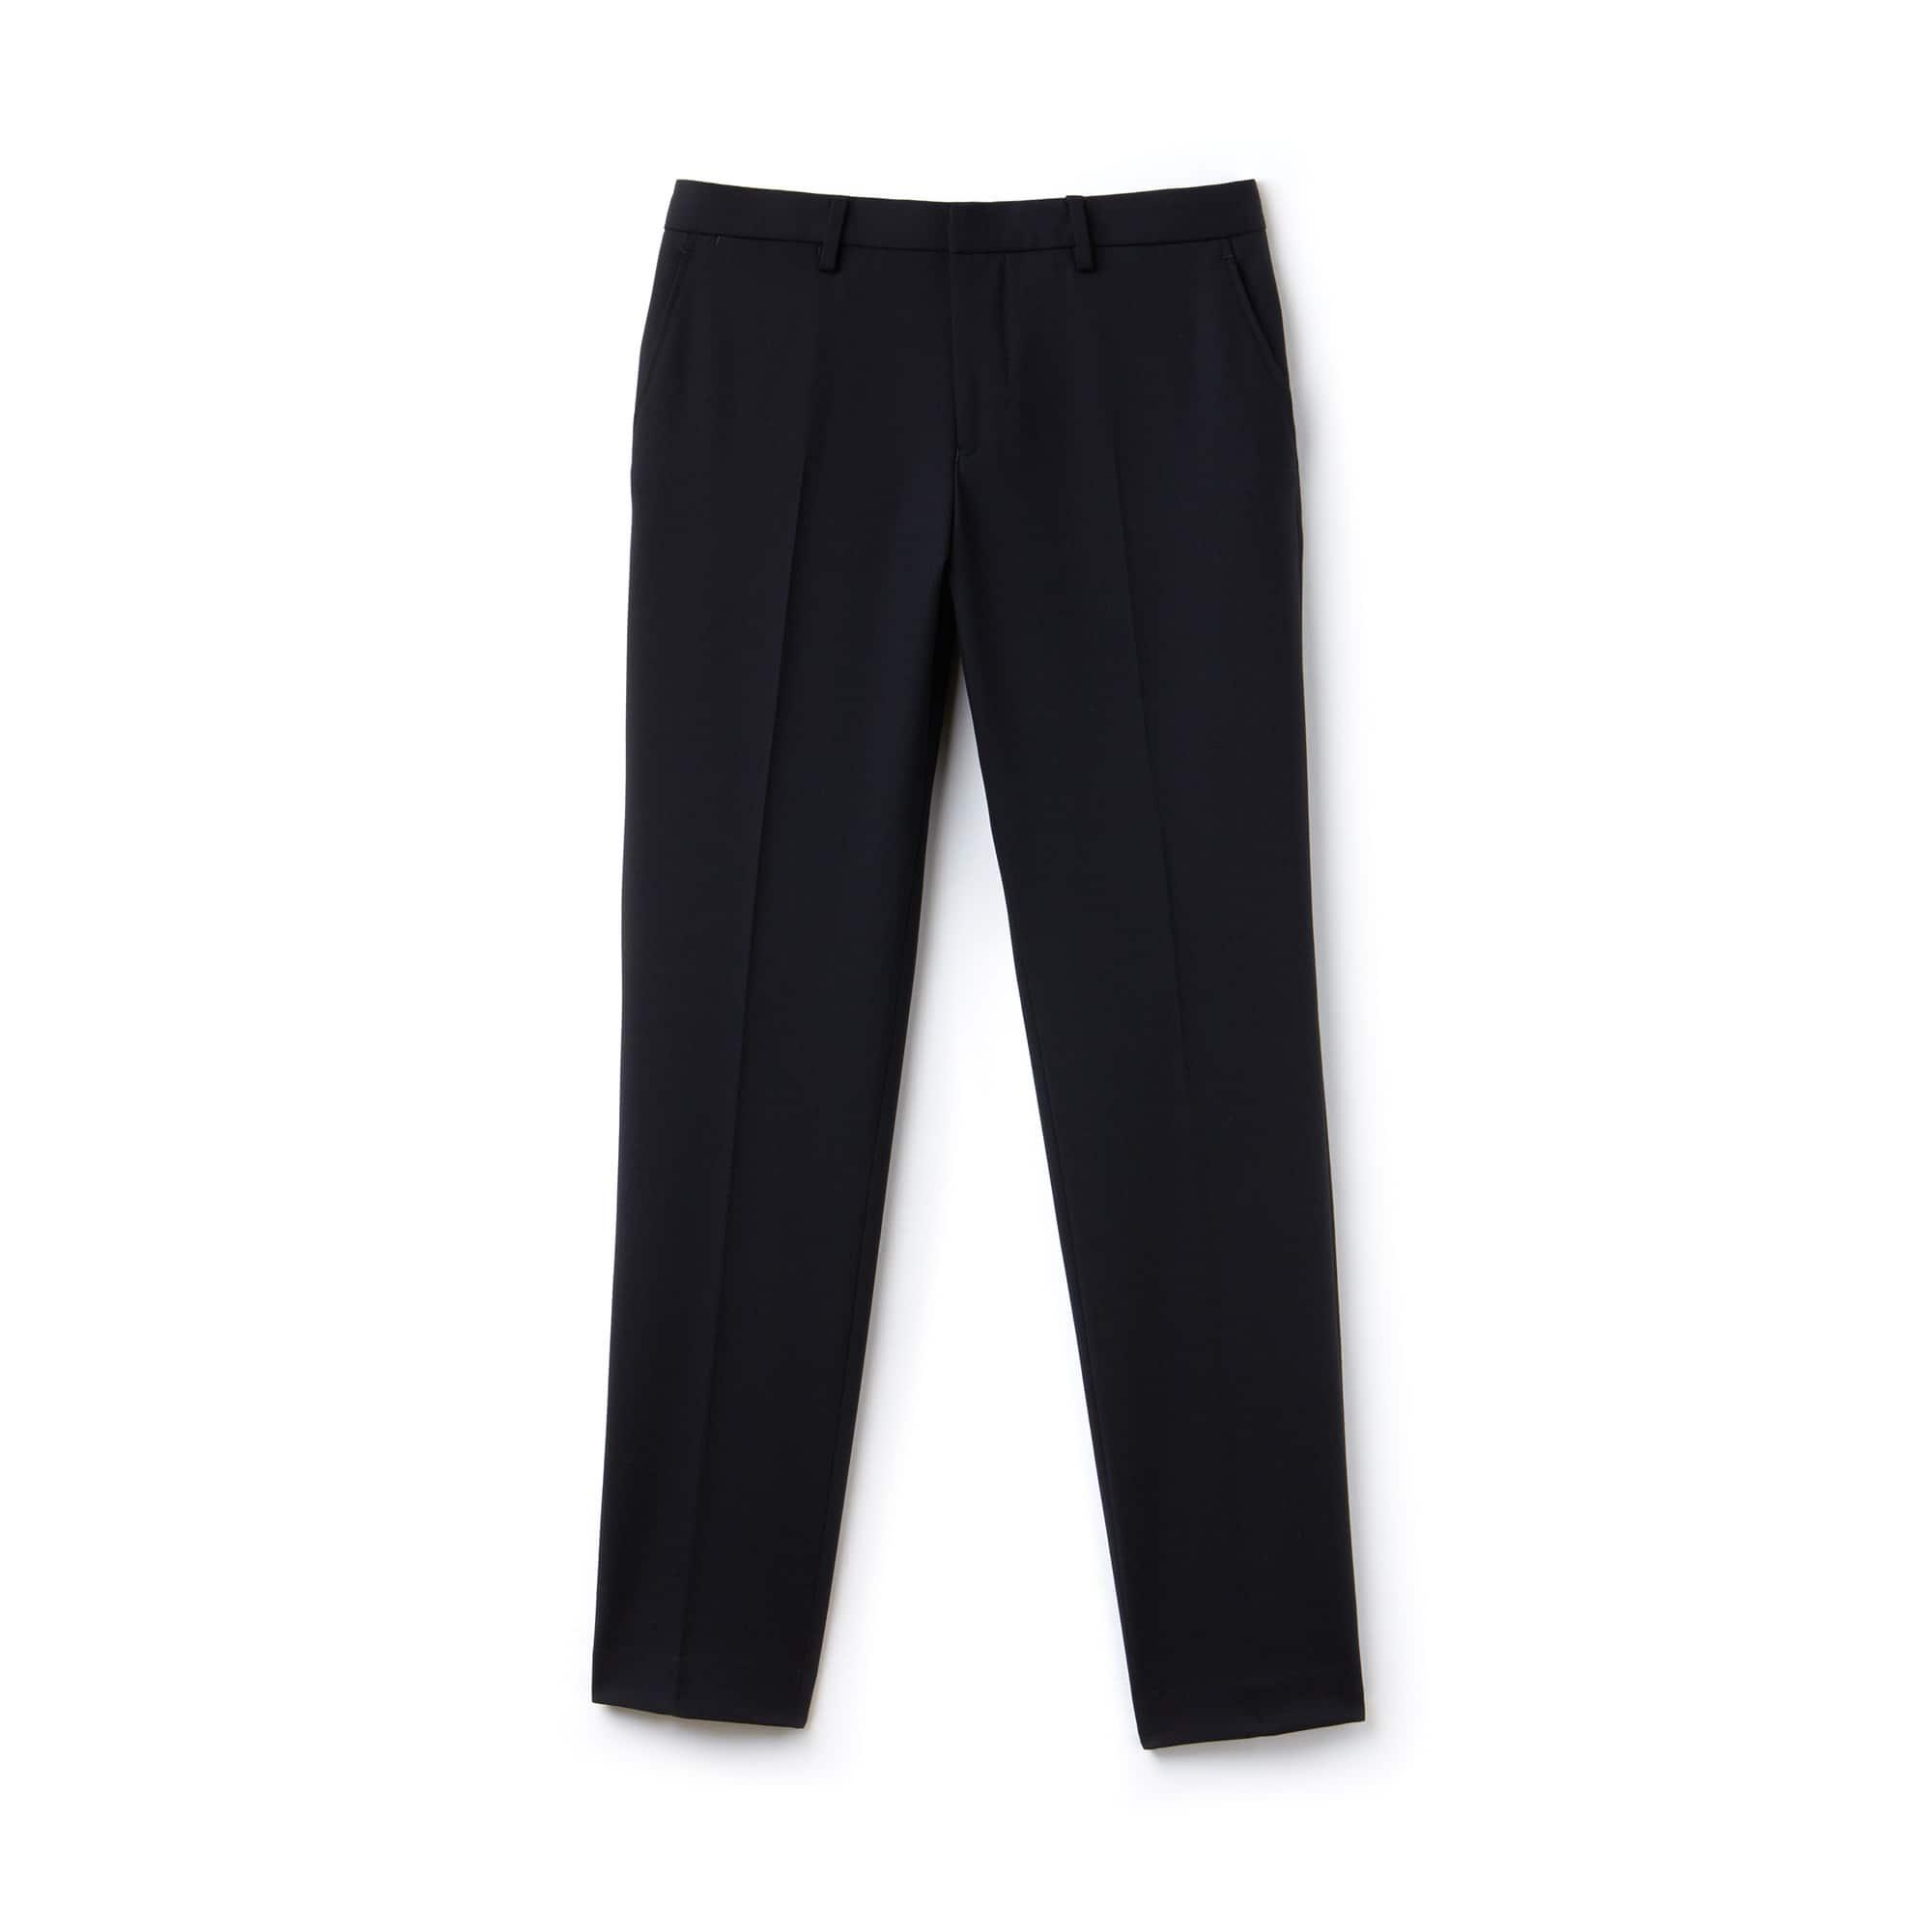 Men's Slim Fit Stretch Twill Chino Pants